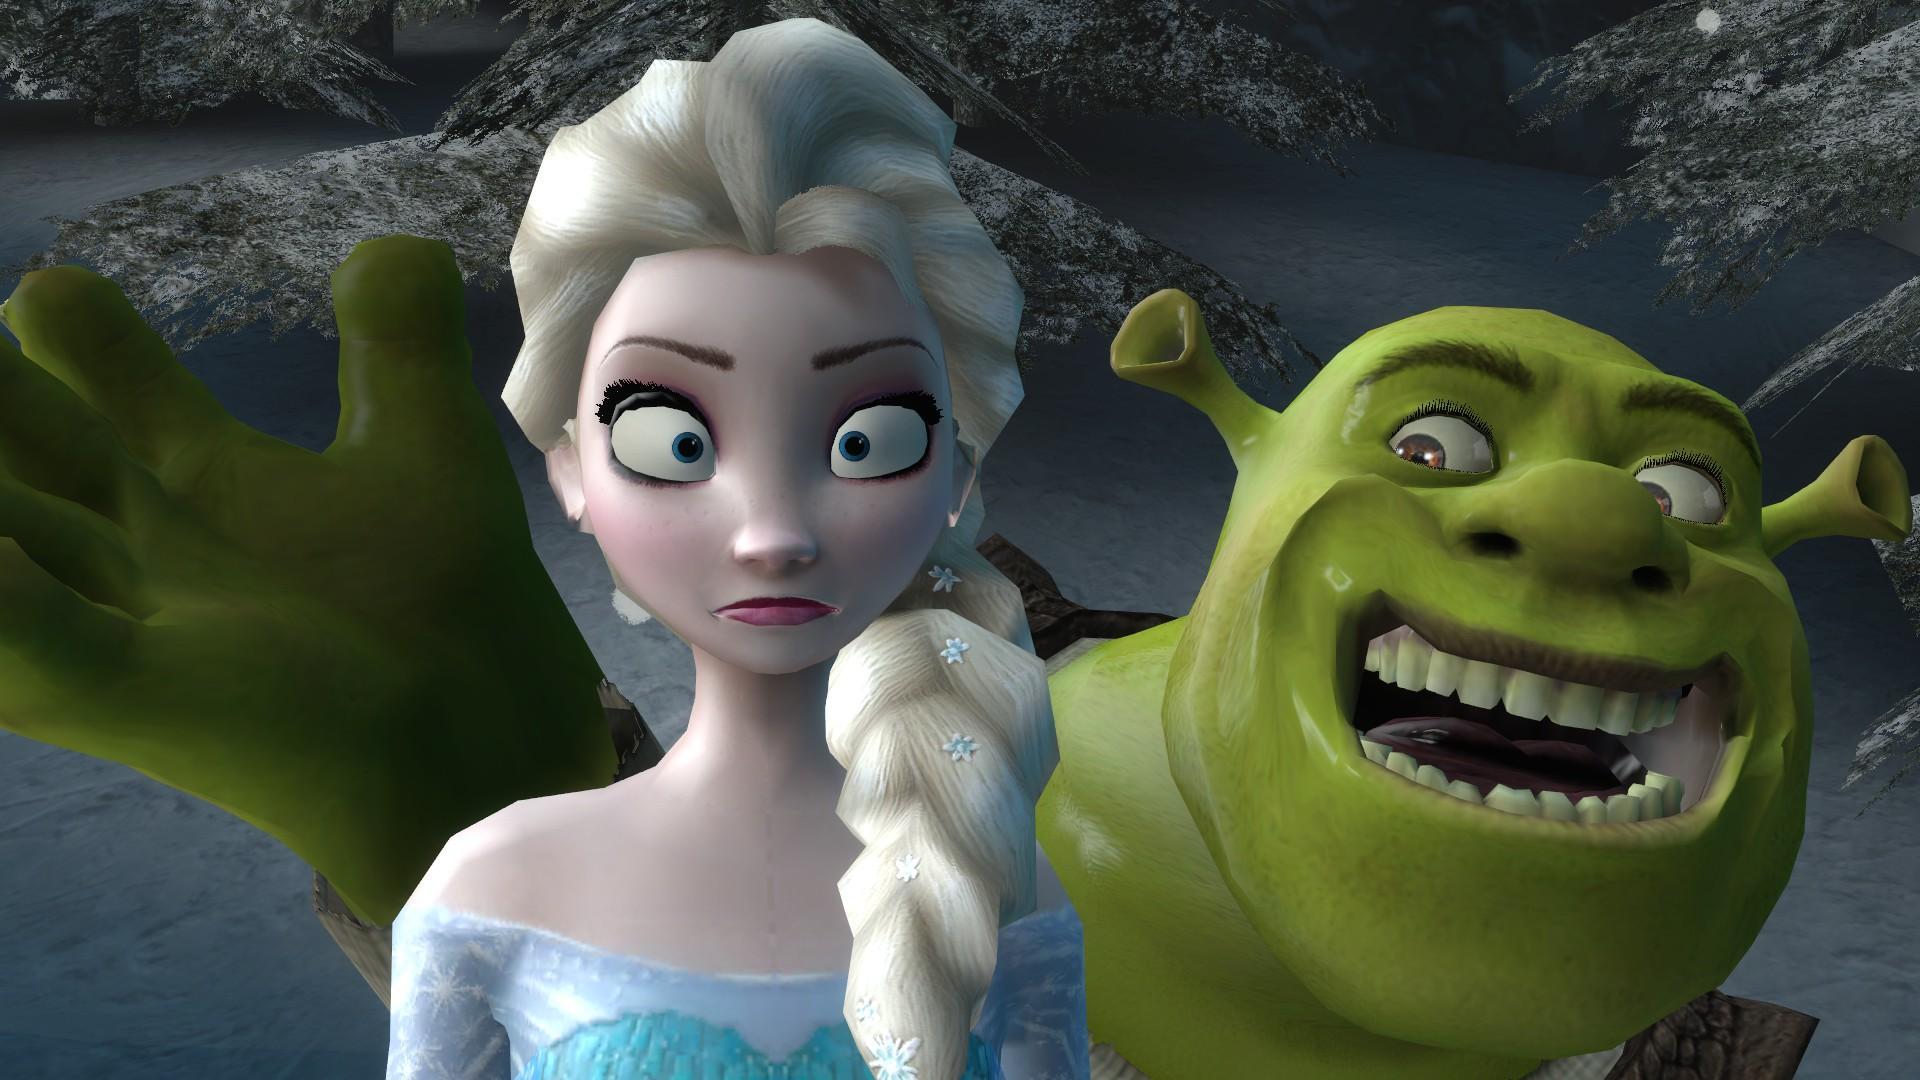 Taylor Swift Song Quotes Wallpaper Let It Shrek Shrek Know Your Meme